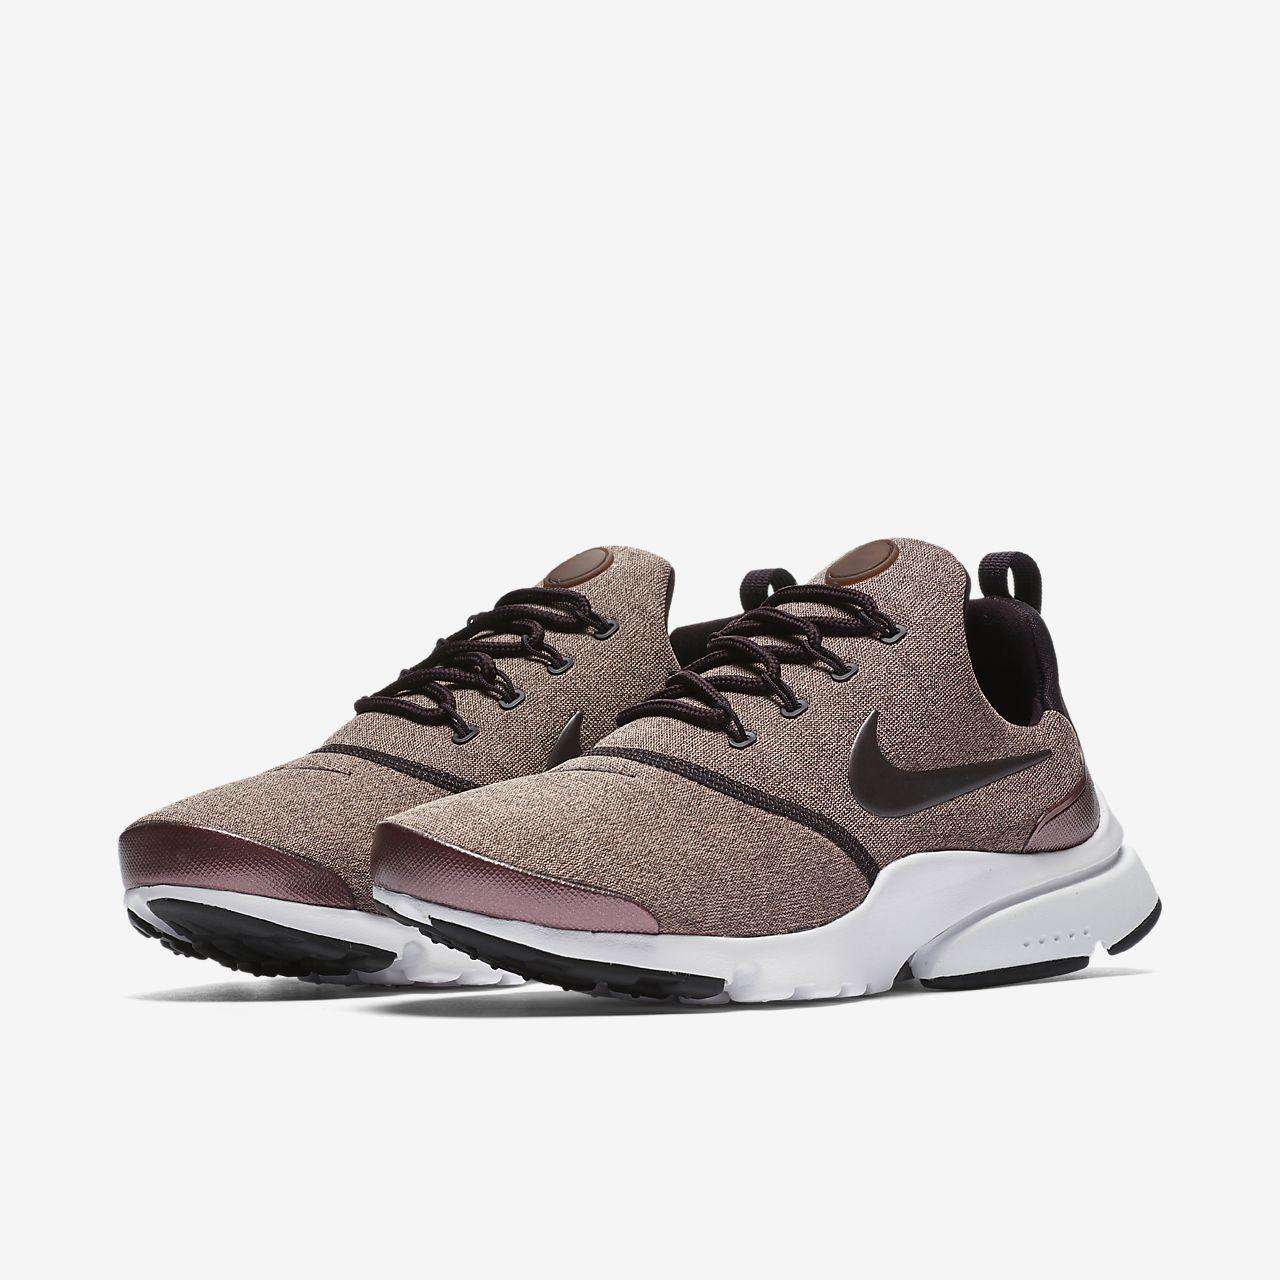 brand new b7f49 62cee Nike Presto Fly SE Women's Shoe | If The Shoe Fits... in ...